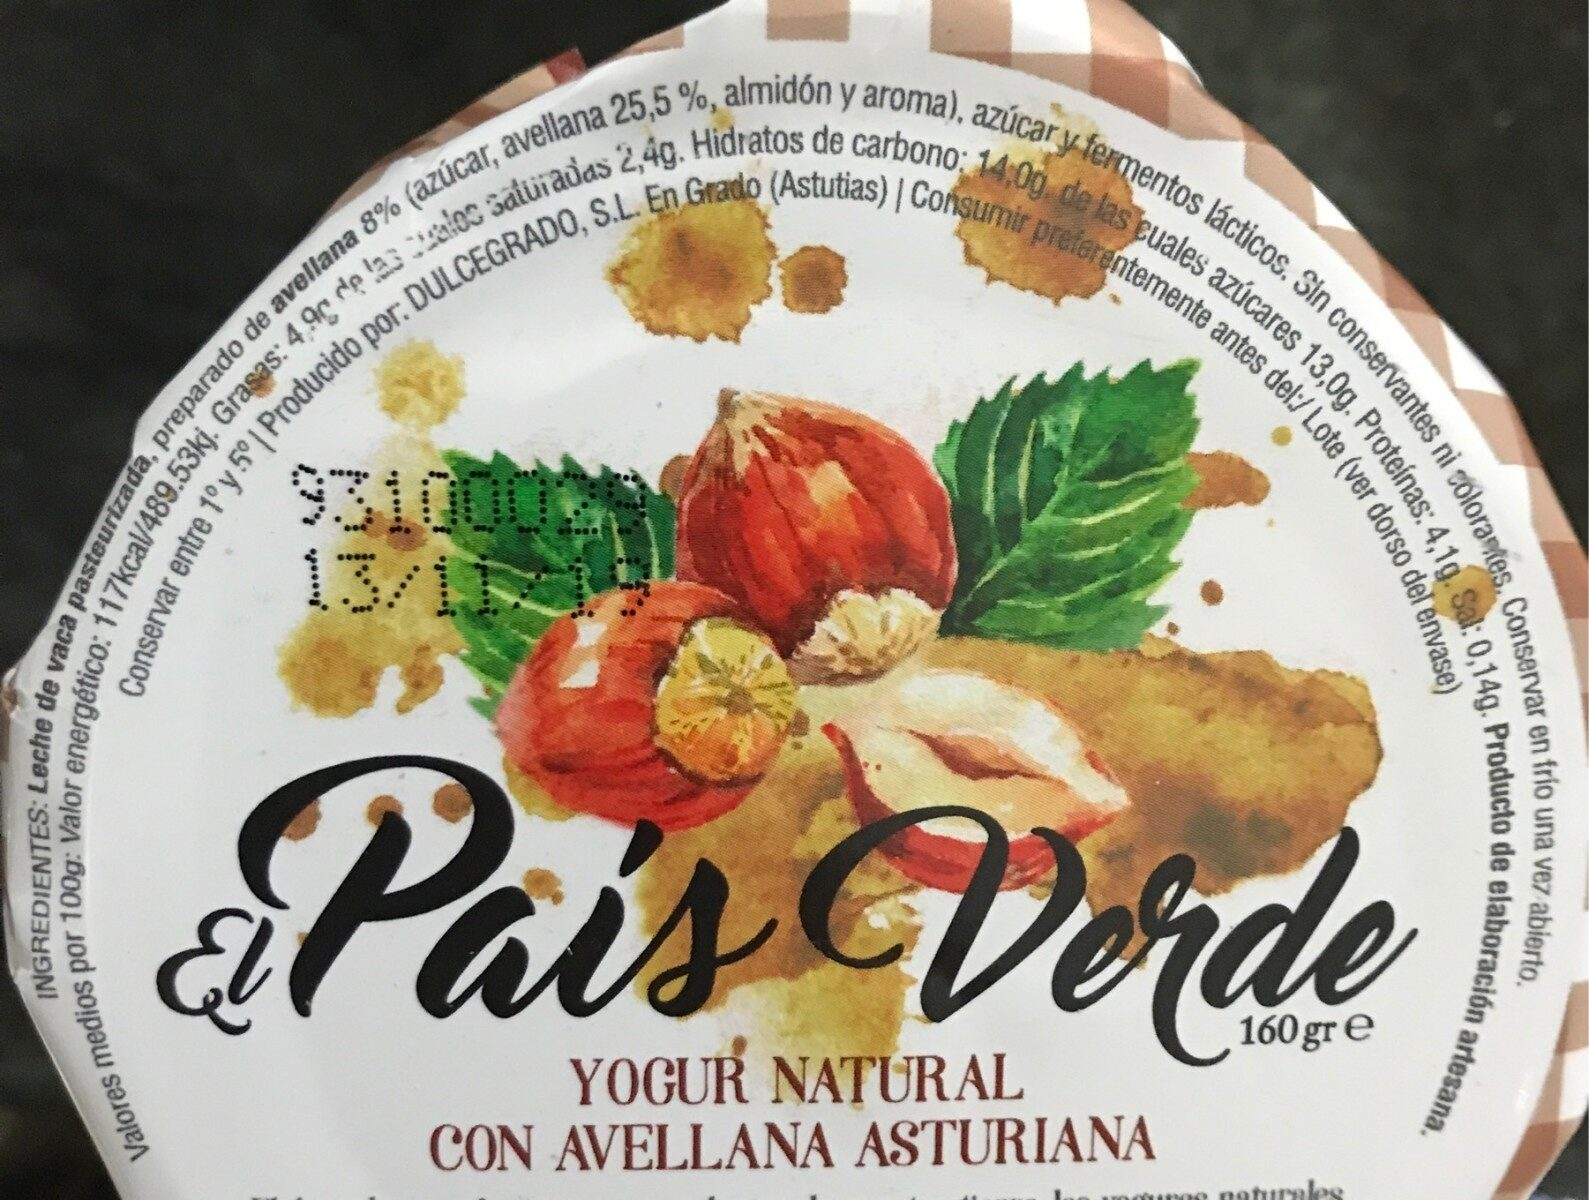 Yogur Natural con avellana Asturiana - Producte - es